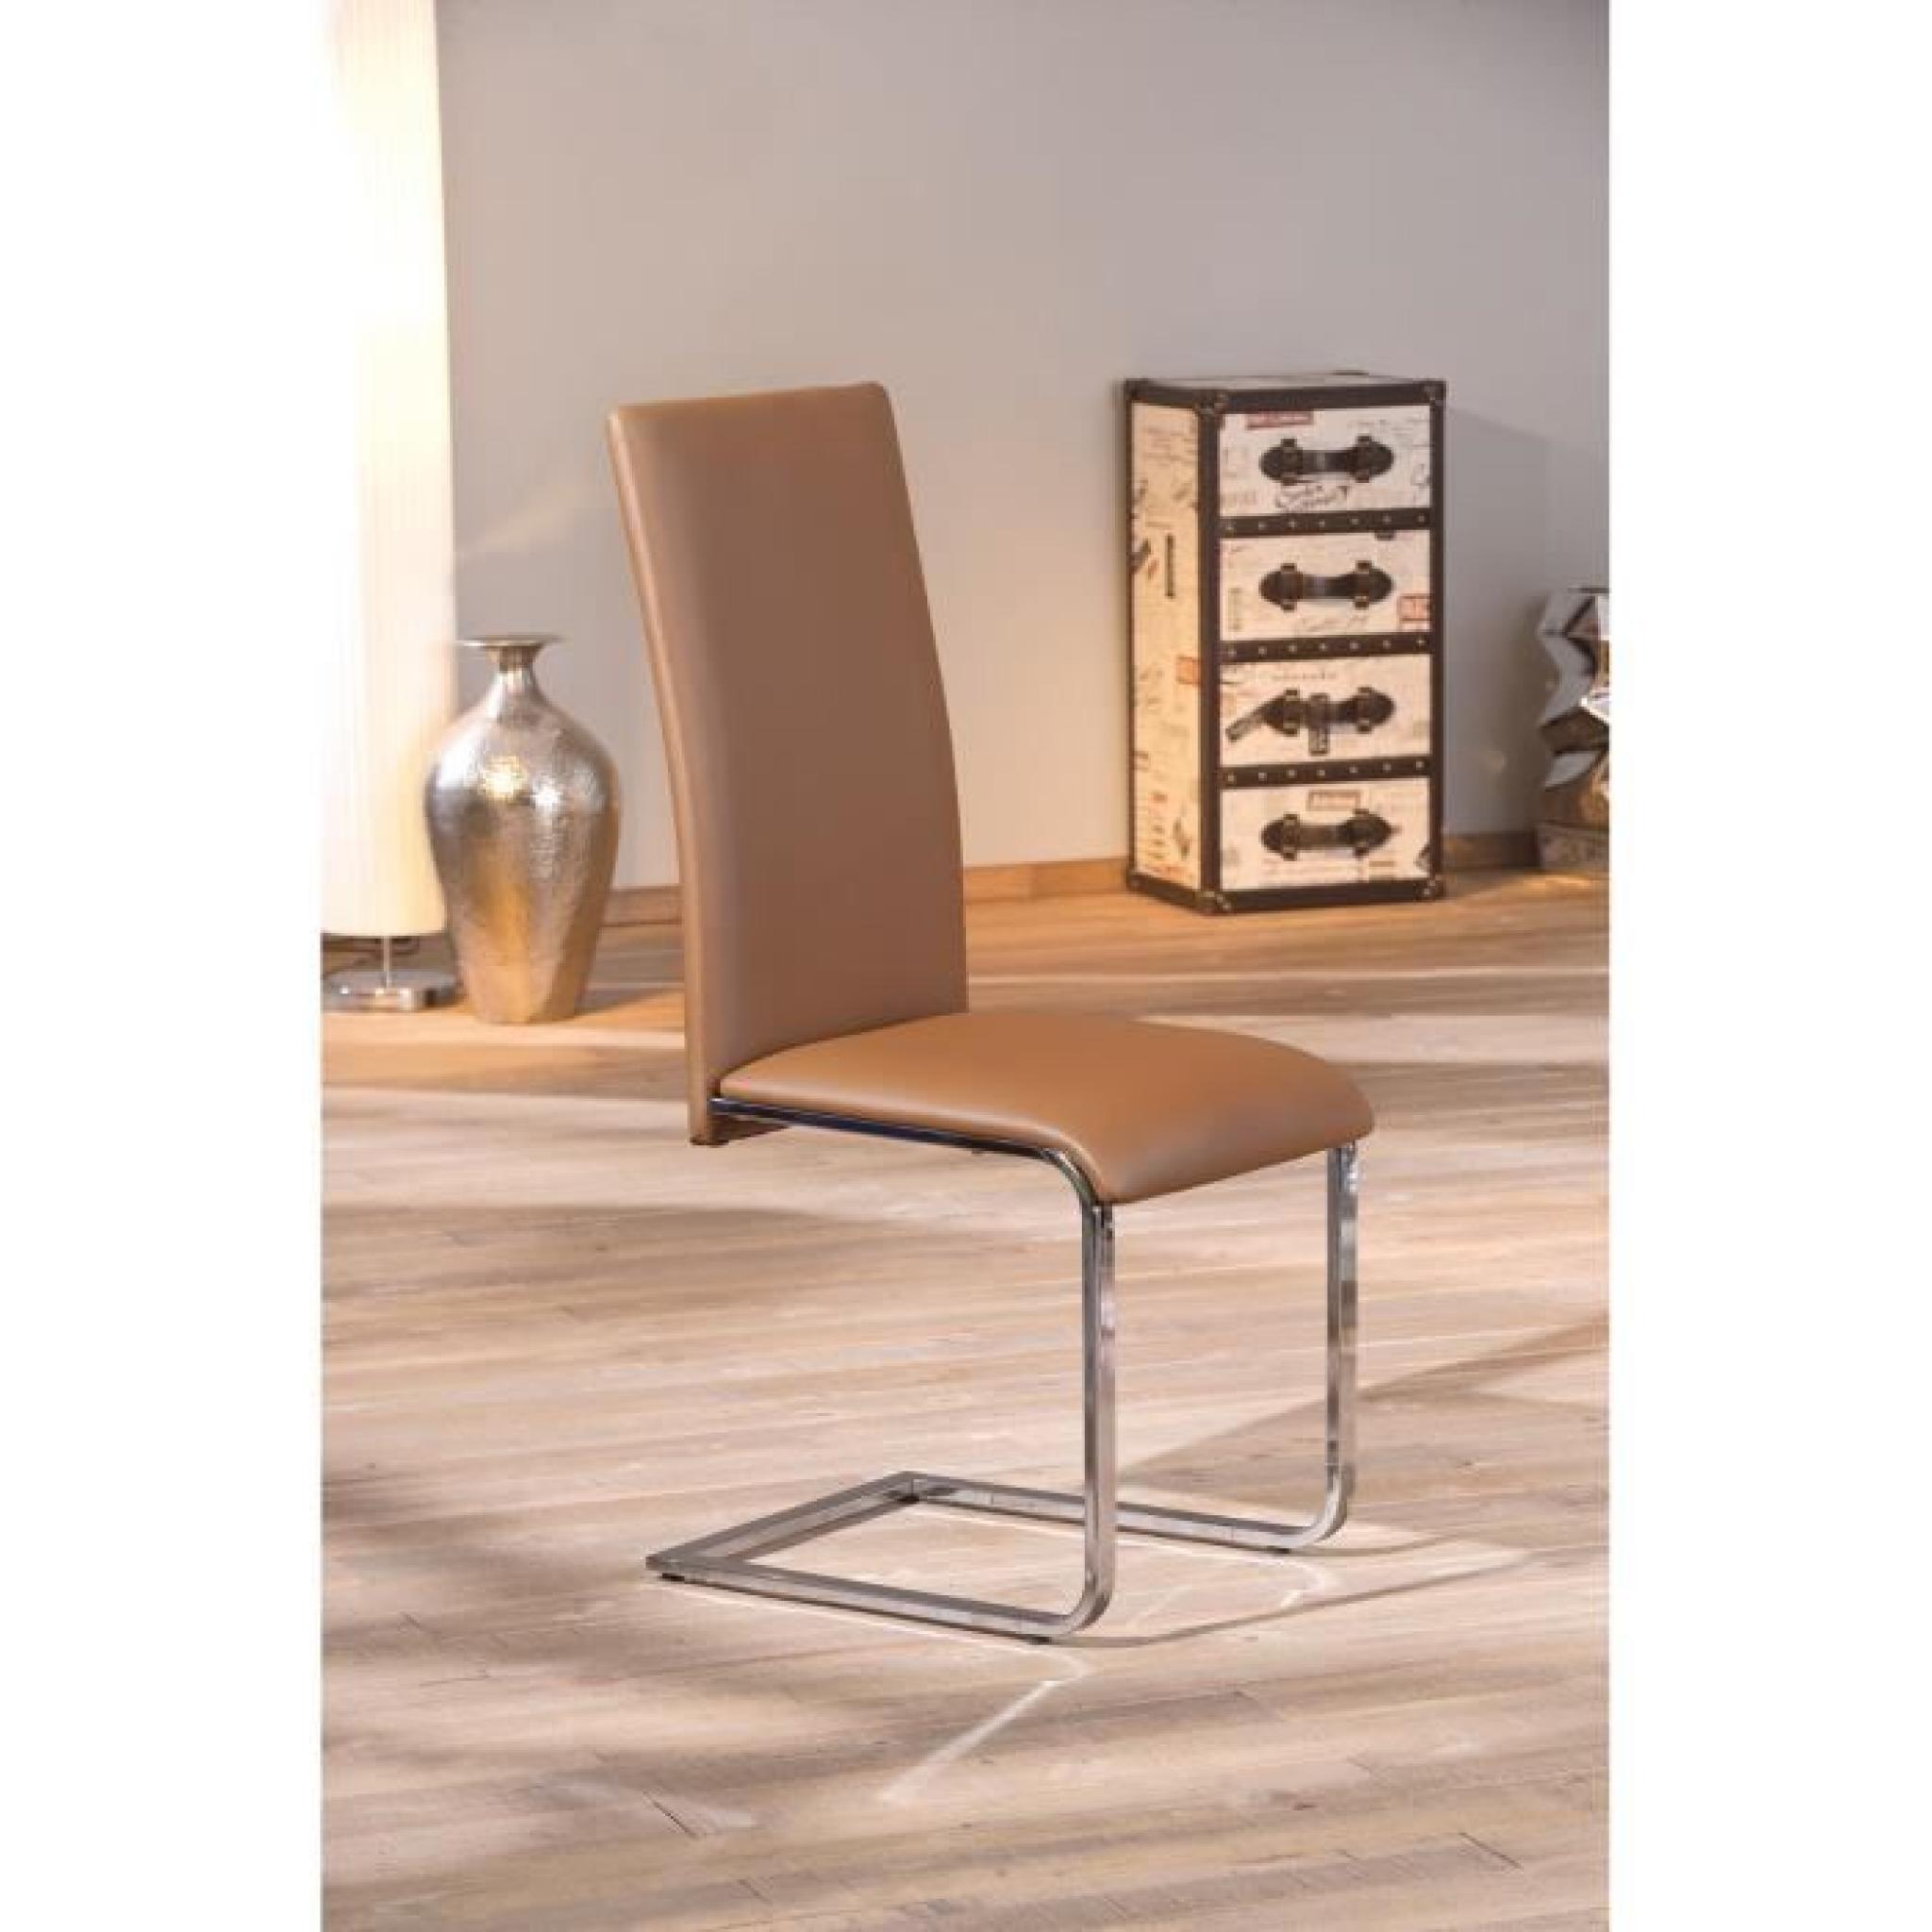 chaise moderne design cuisine s jour salle mange achat vente chaise salle a manger pas cher. Black Bedroom Furniture Sets. Home Design Ideas